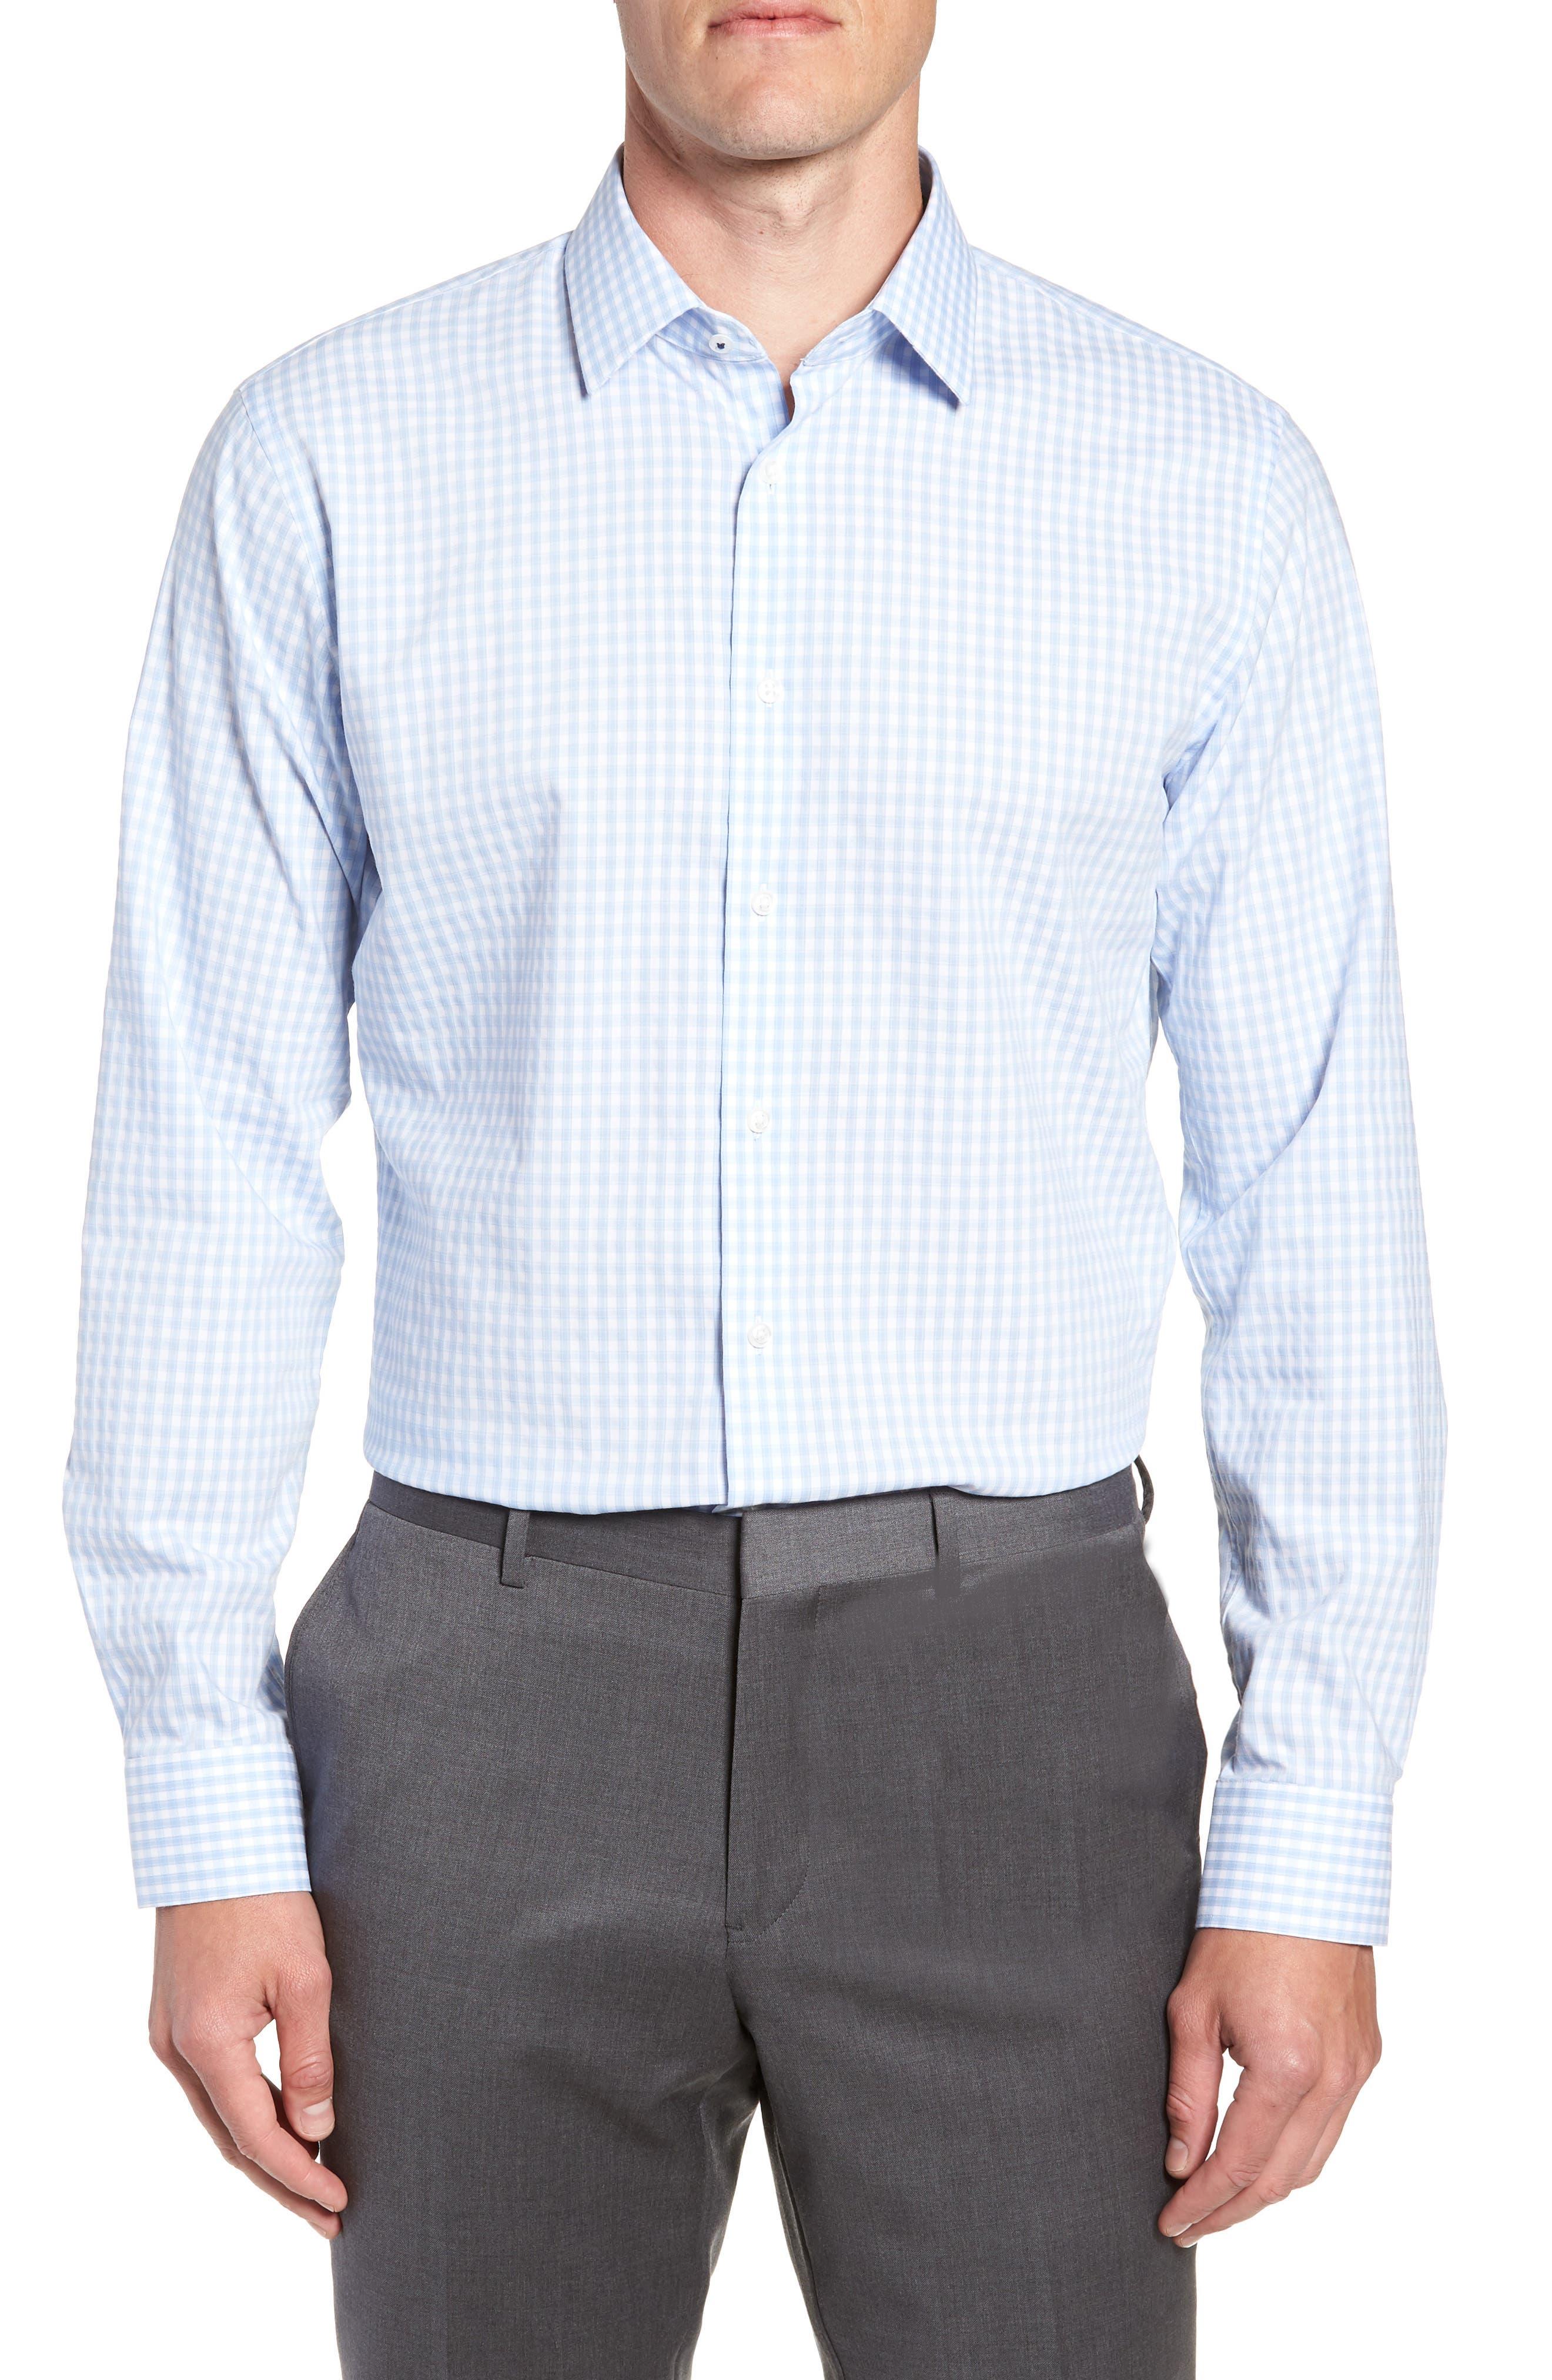 Tech-Smart Trim Fit Stretch Check Dress Shirt,                             Main thumbnail 1, color,                             BLUE BRUNNERA